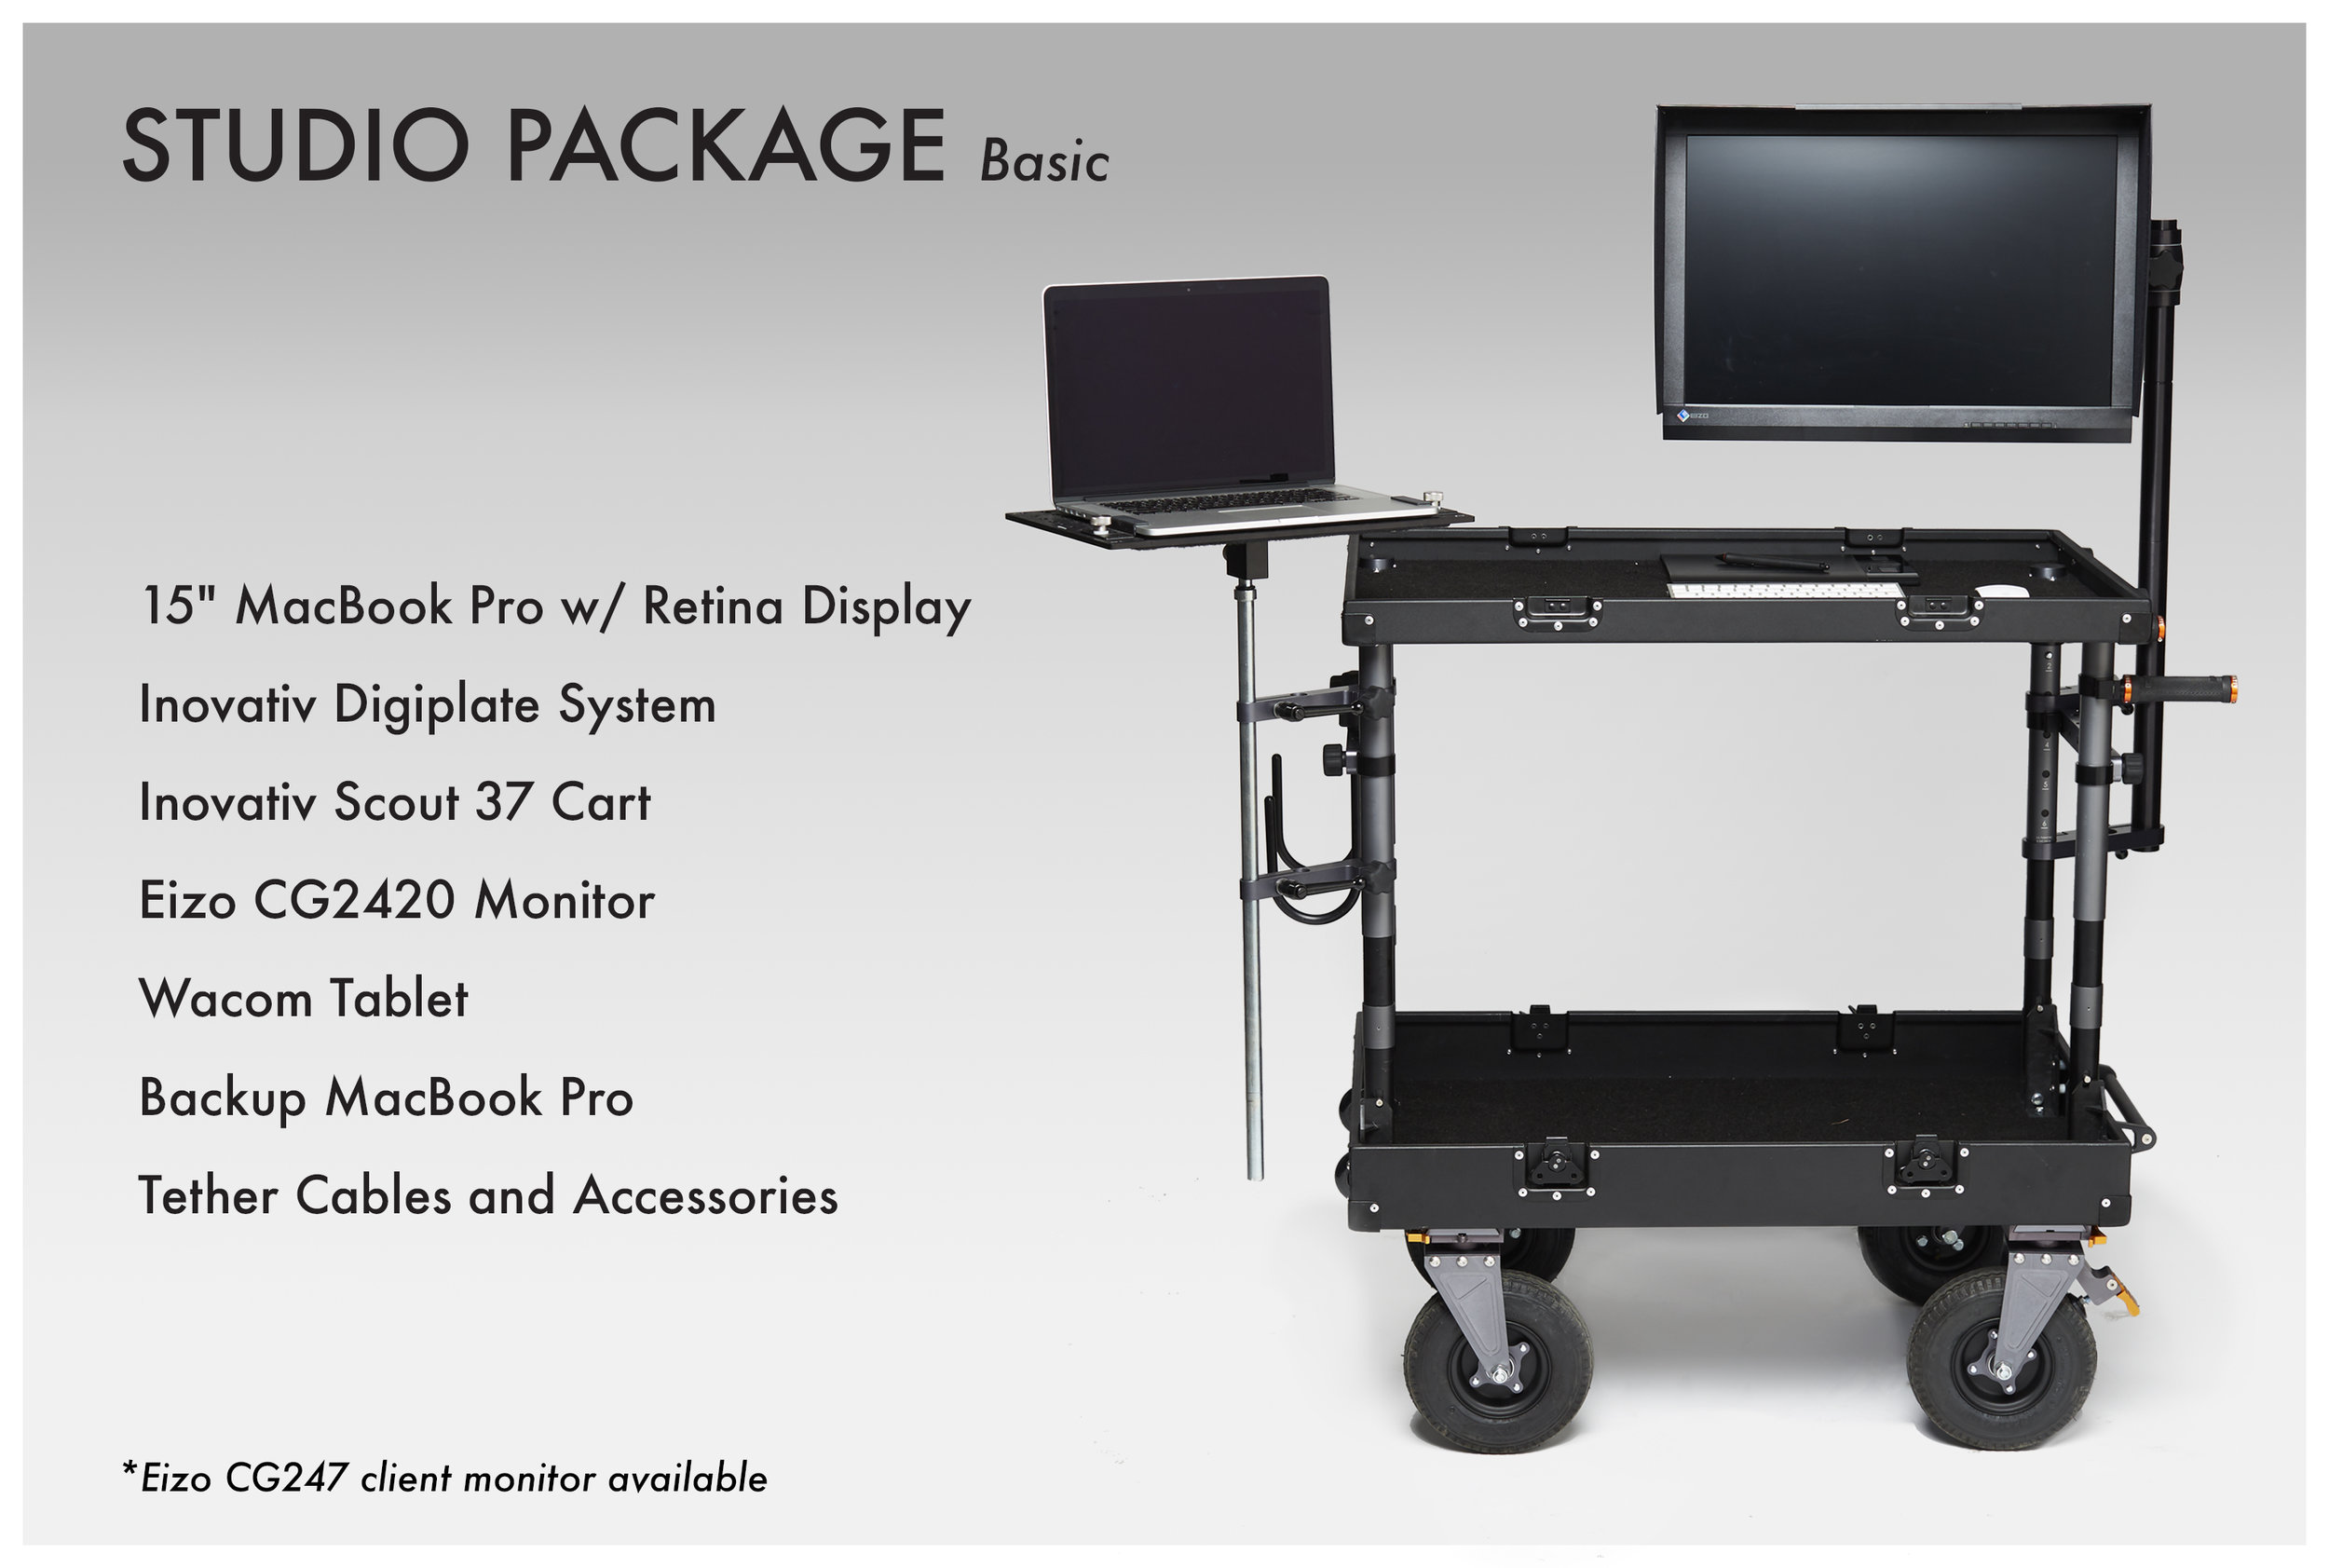 Studio Package Basic